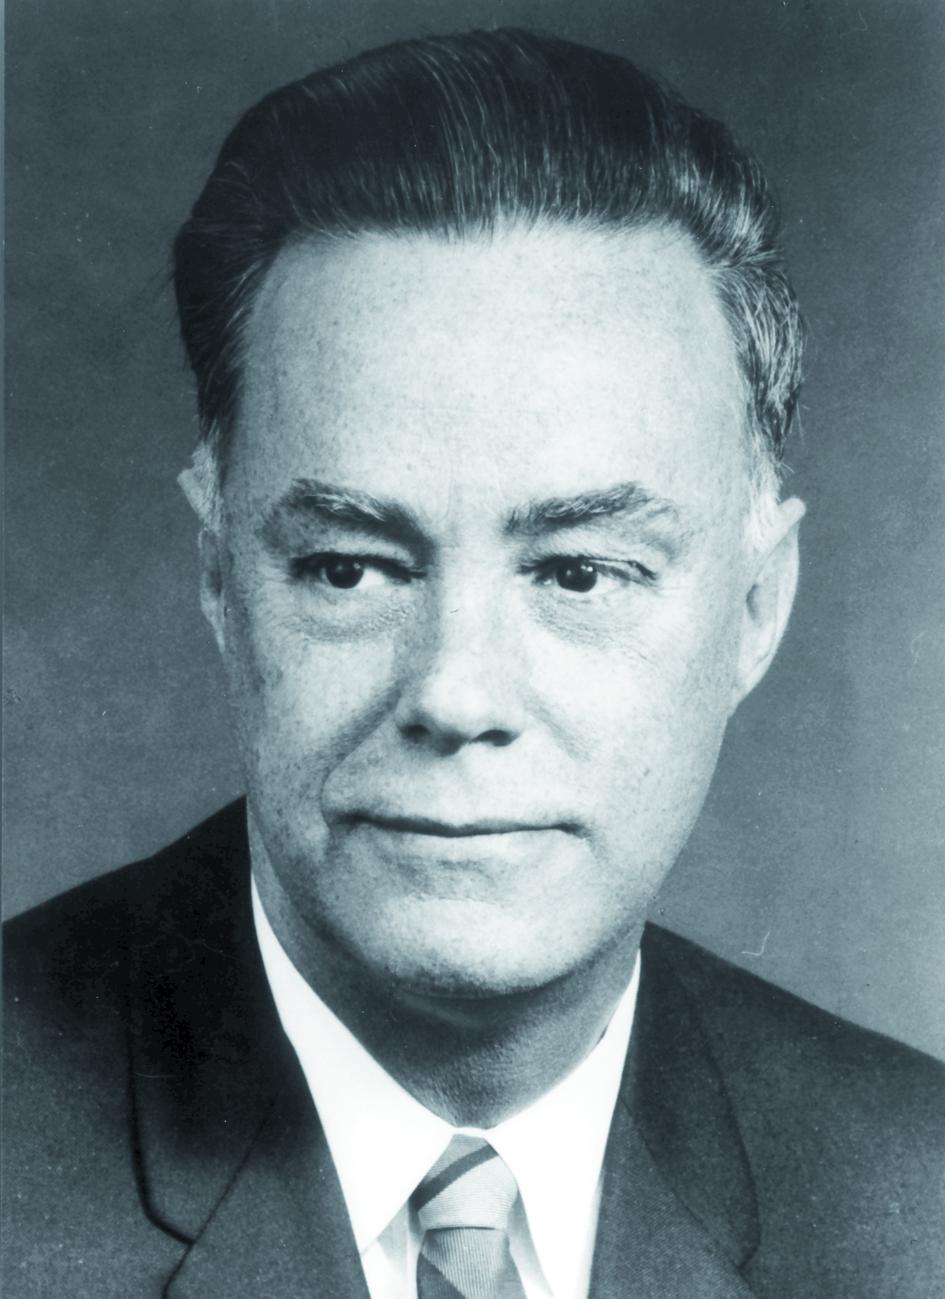 Portraitfoto von Herrn Ruseel Henry Morgan.